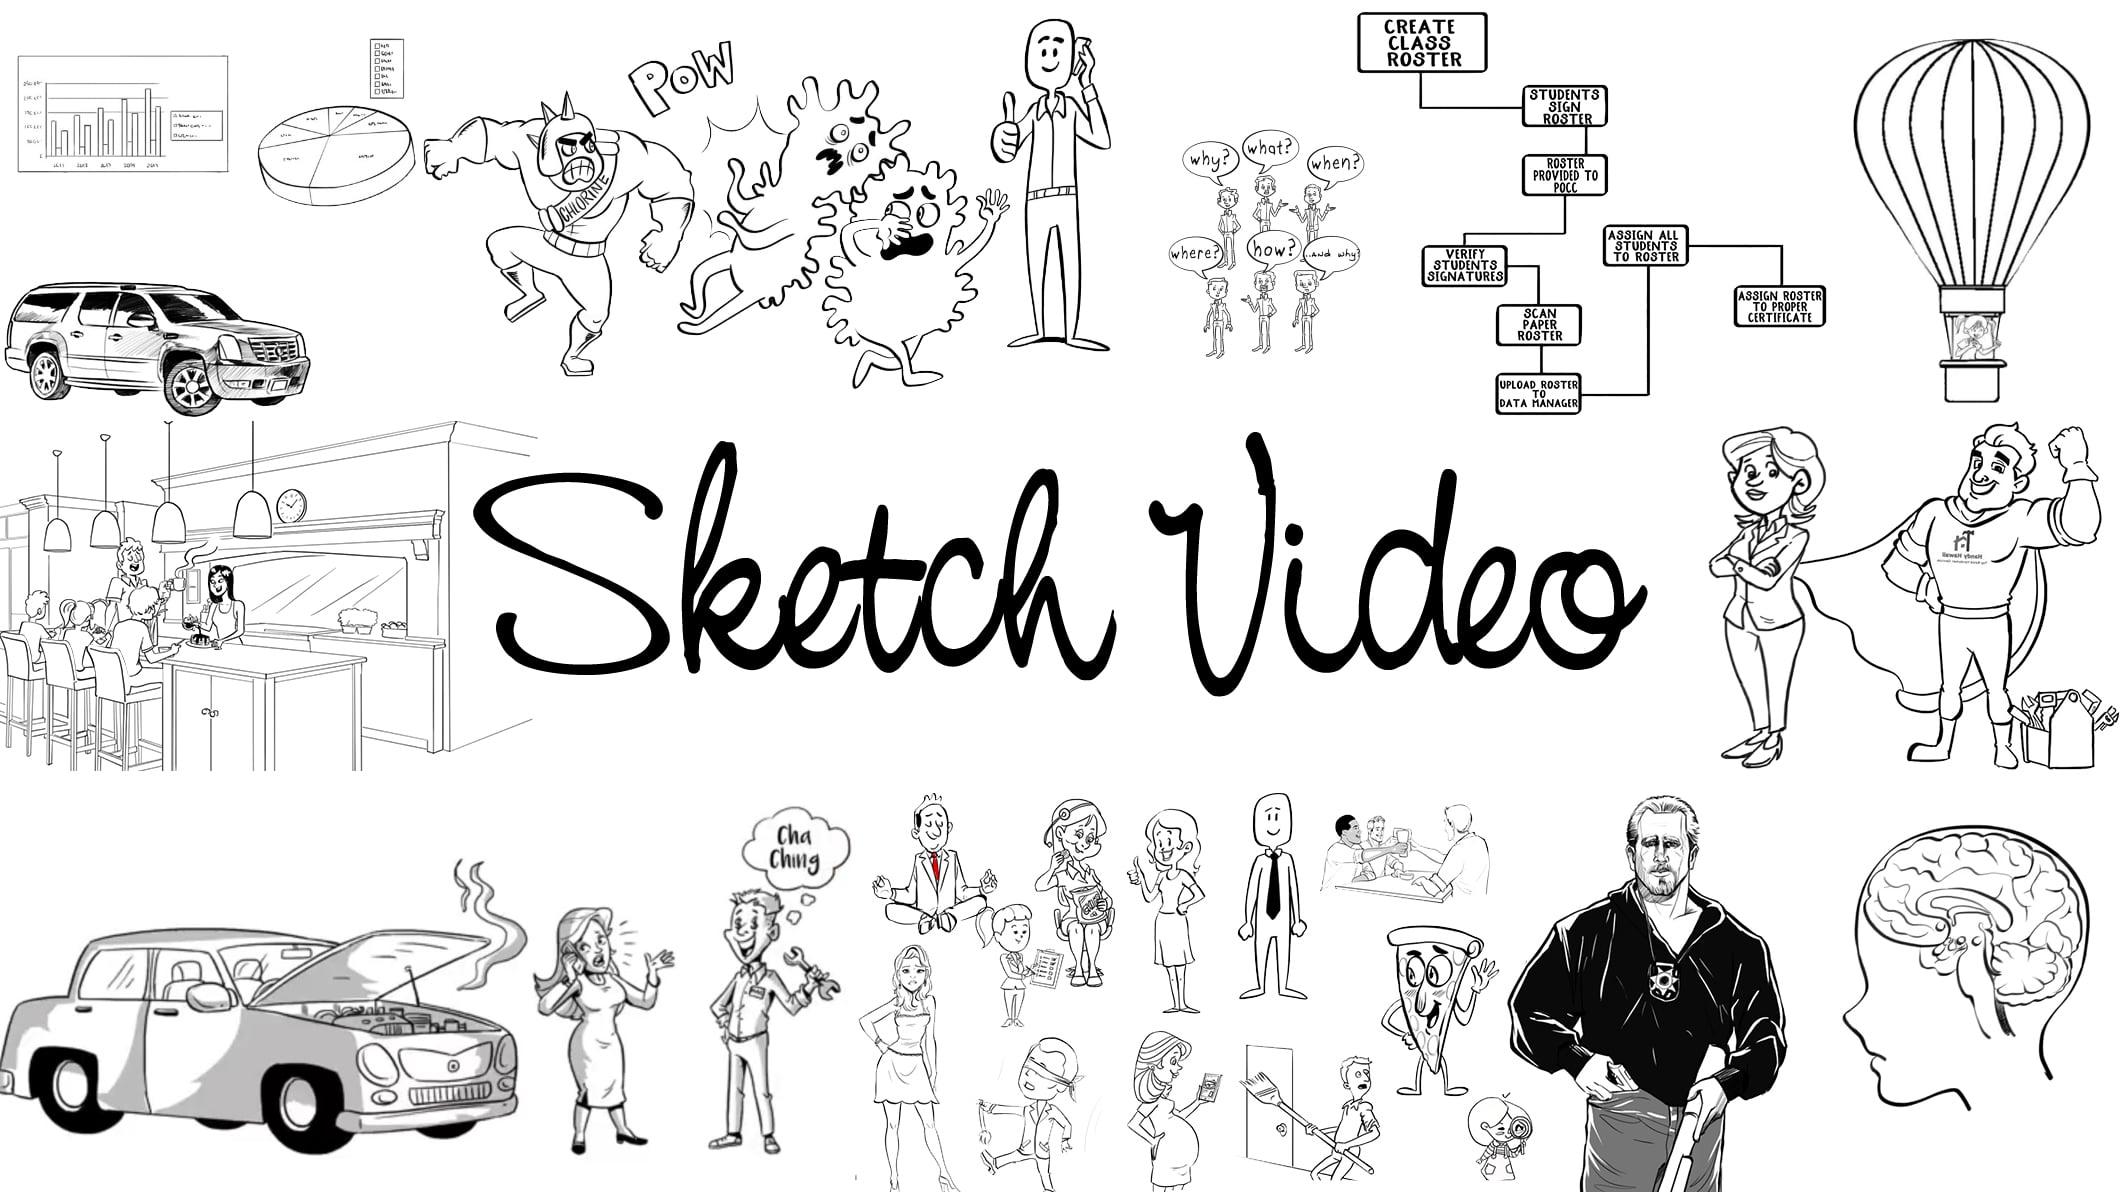 Sketch, Explainer, Animation, Whiteboard Videos